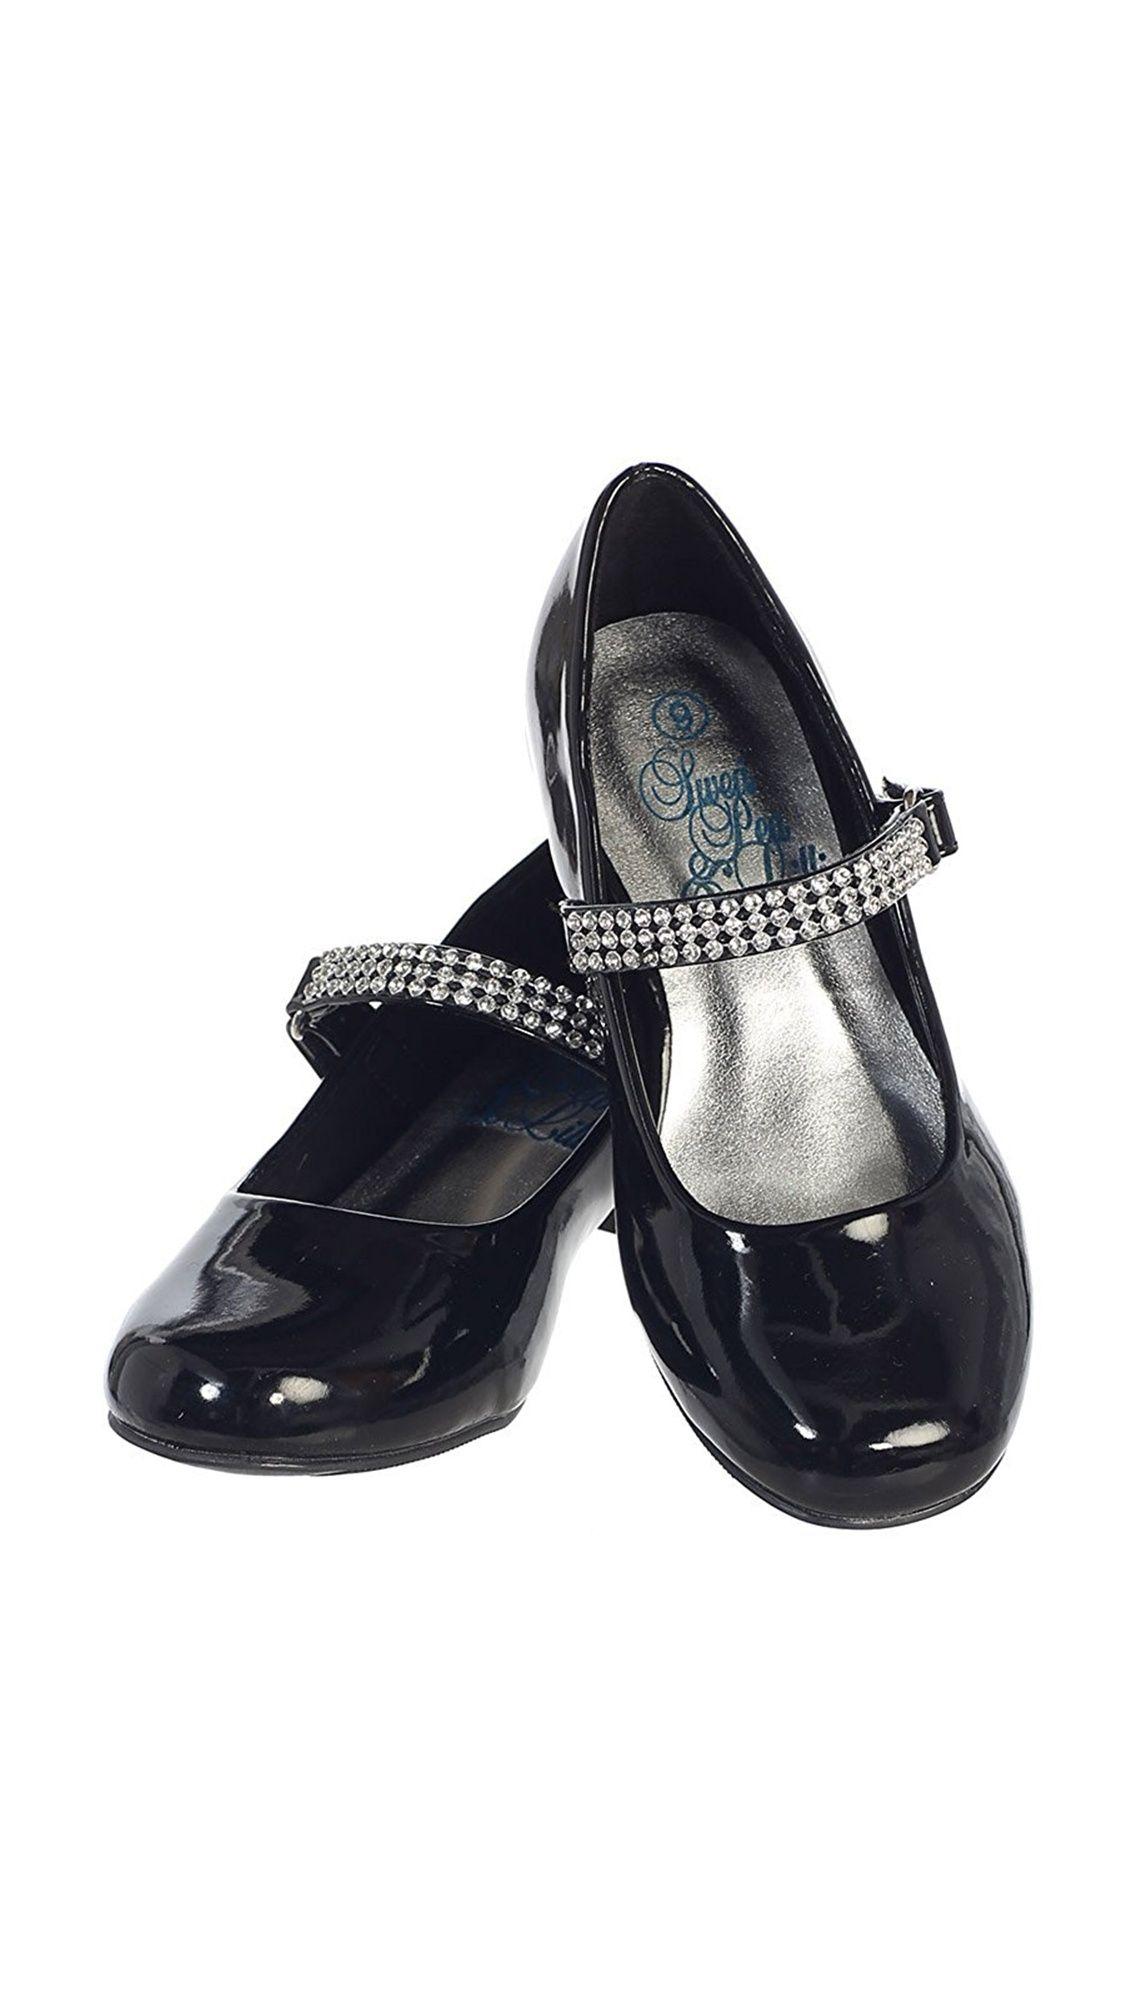 Democracy Apparel Dempsey Marie Girls 1 Low Heel Dress Shoe With Rhinestone Strap In Ivory White Or Black Walmart Com Low Heel Dress Shoes Dress And Heels Low Heels [ 1999 x 1125 Pixel ]